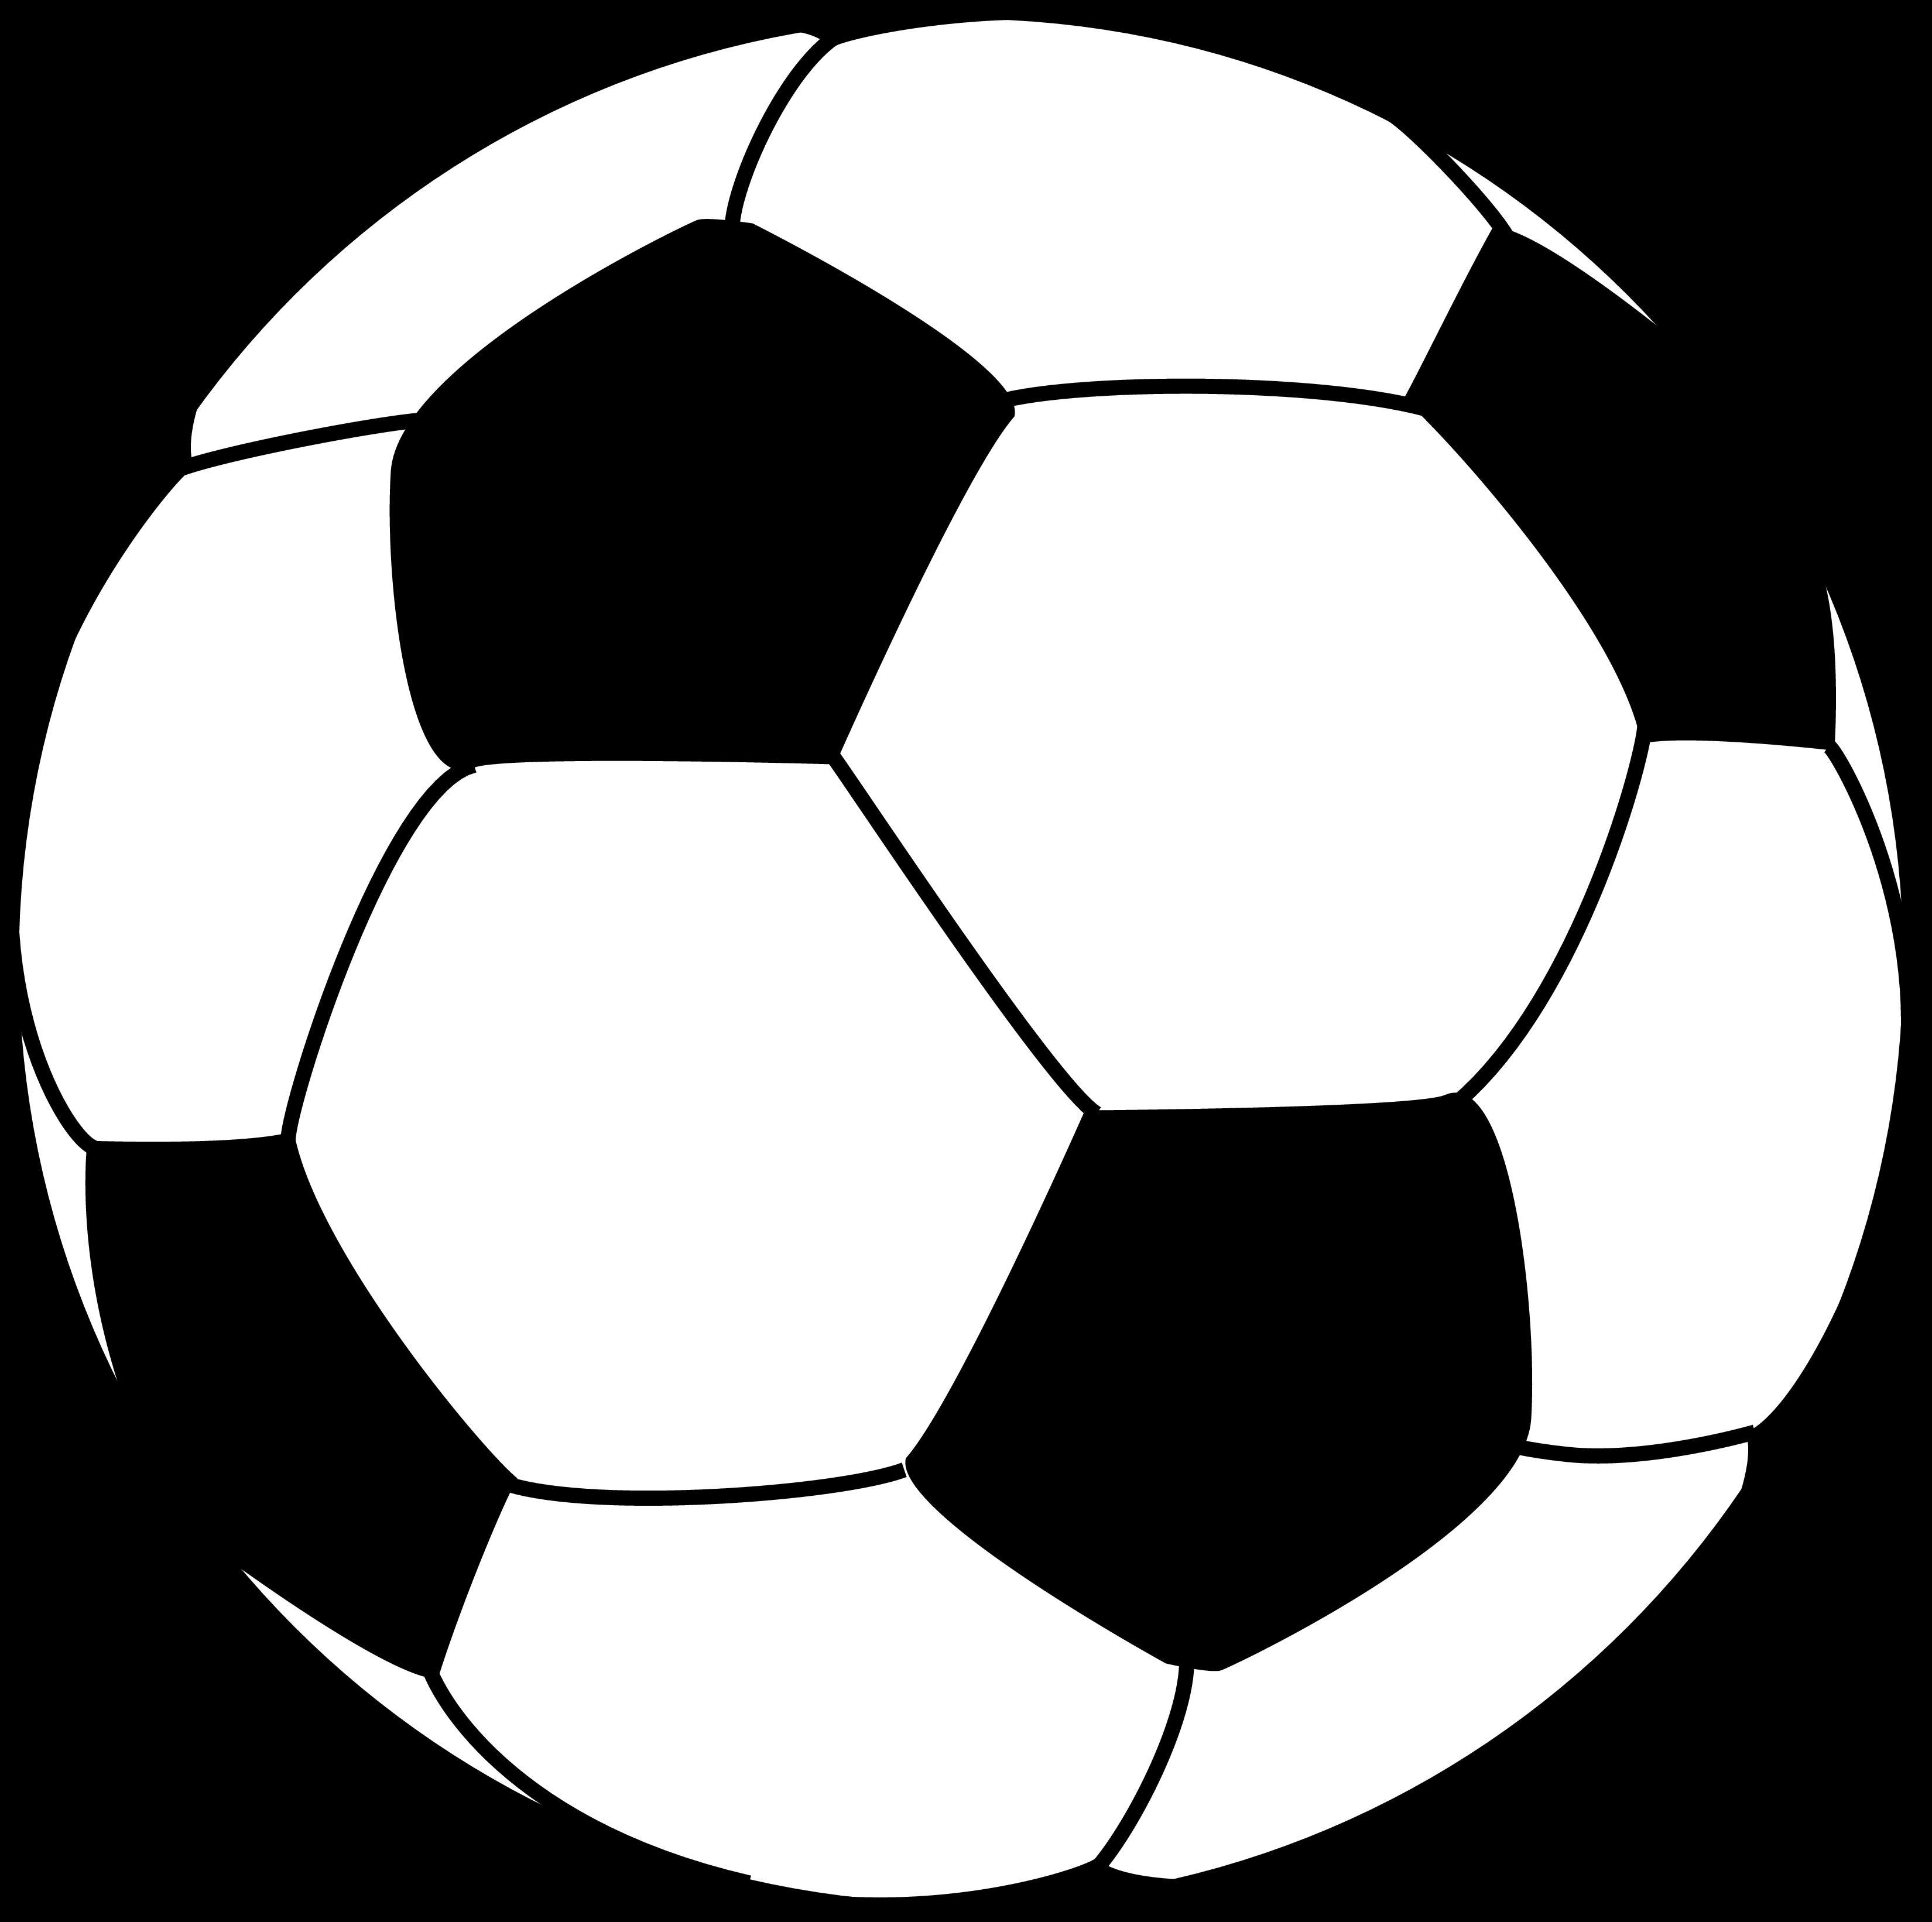 Football outline clipart black and white jpg stock Soccer Ball Outline   Free download best Soccer Ball Outline on ... jpg stock